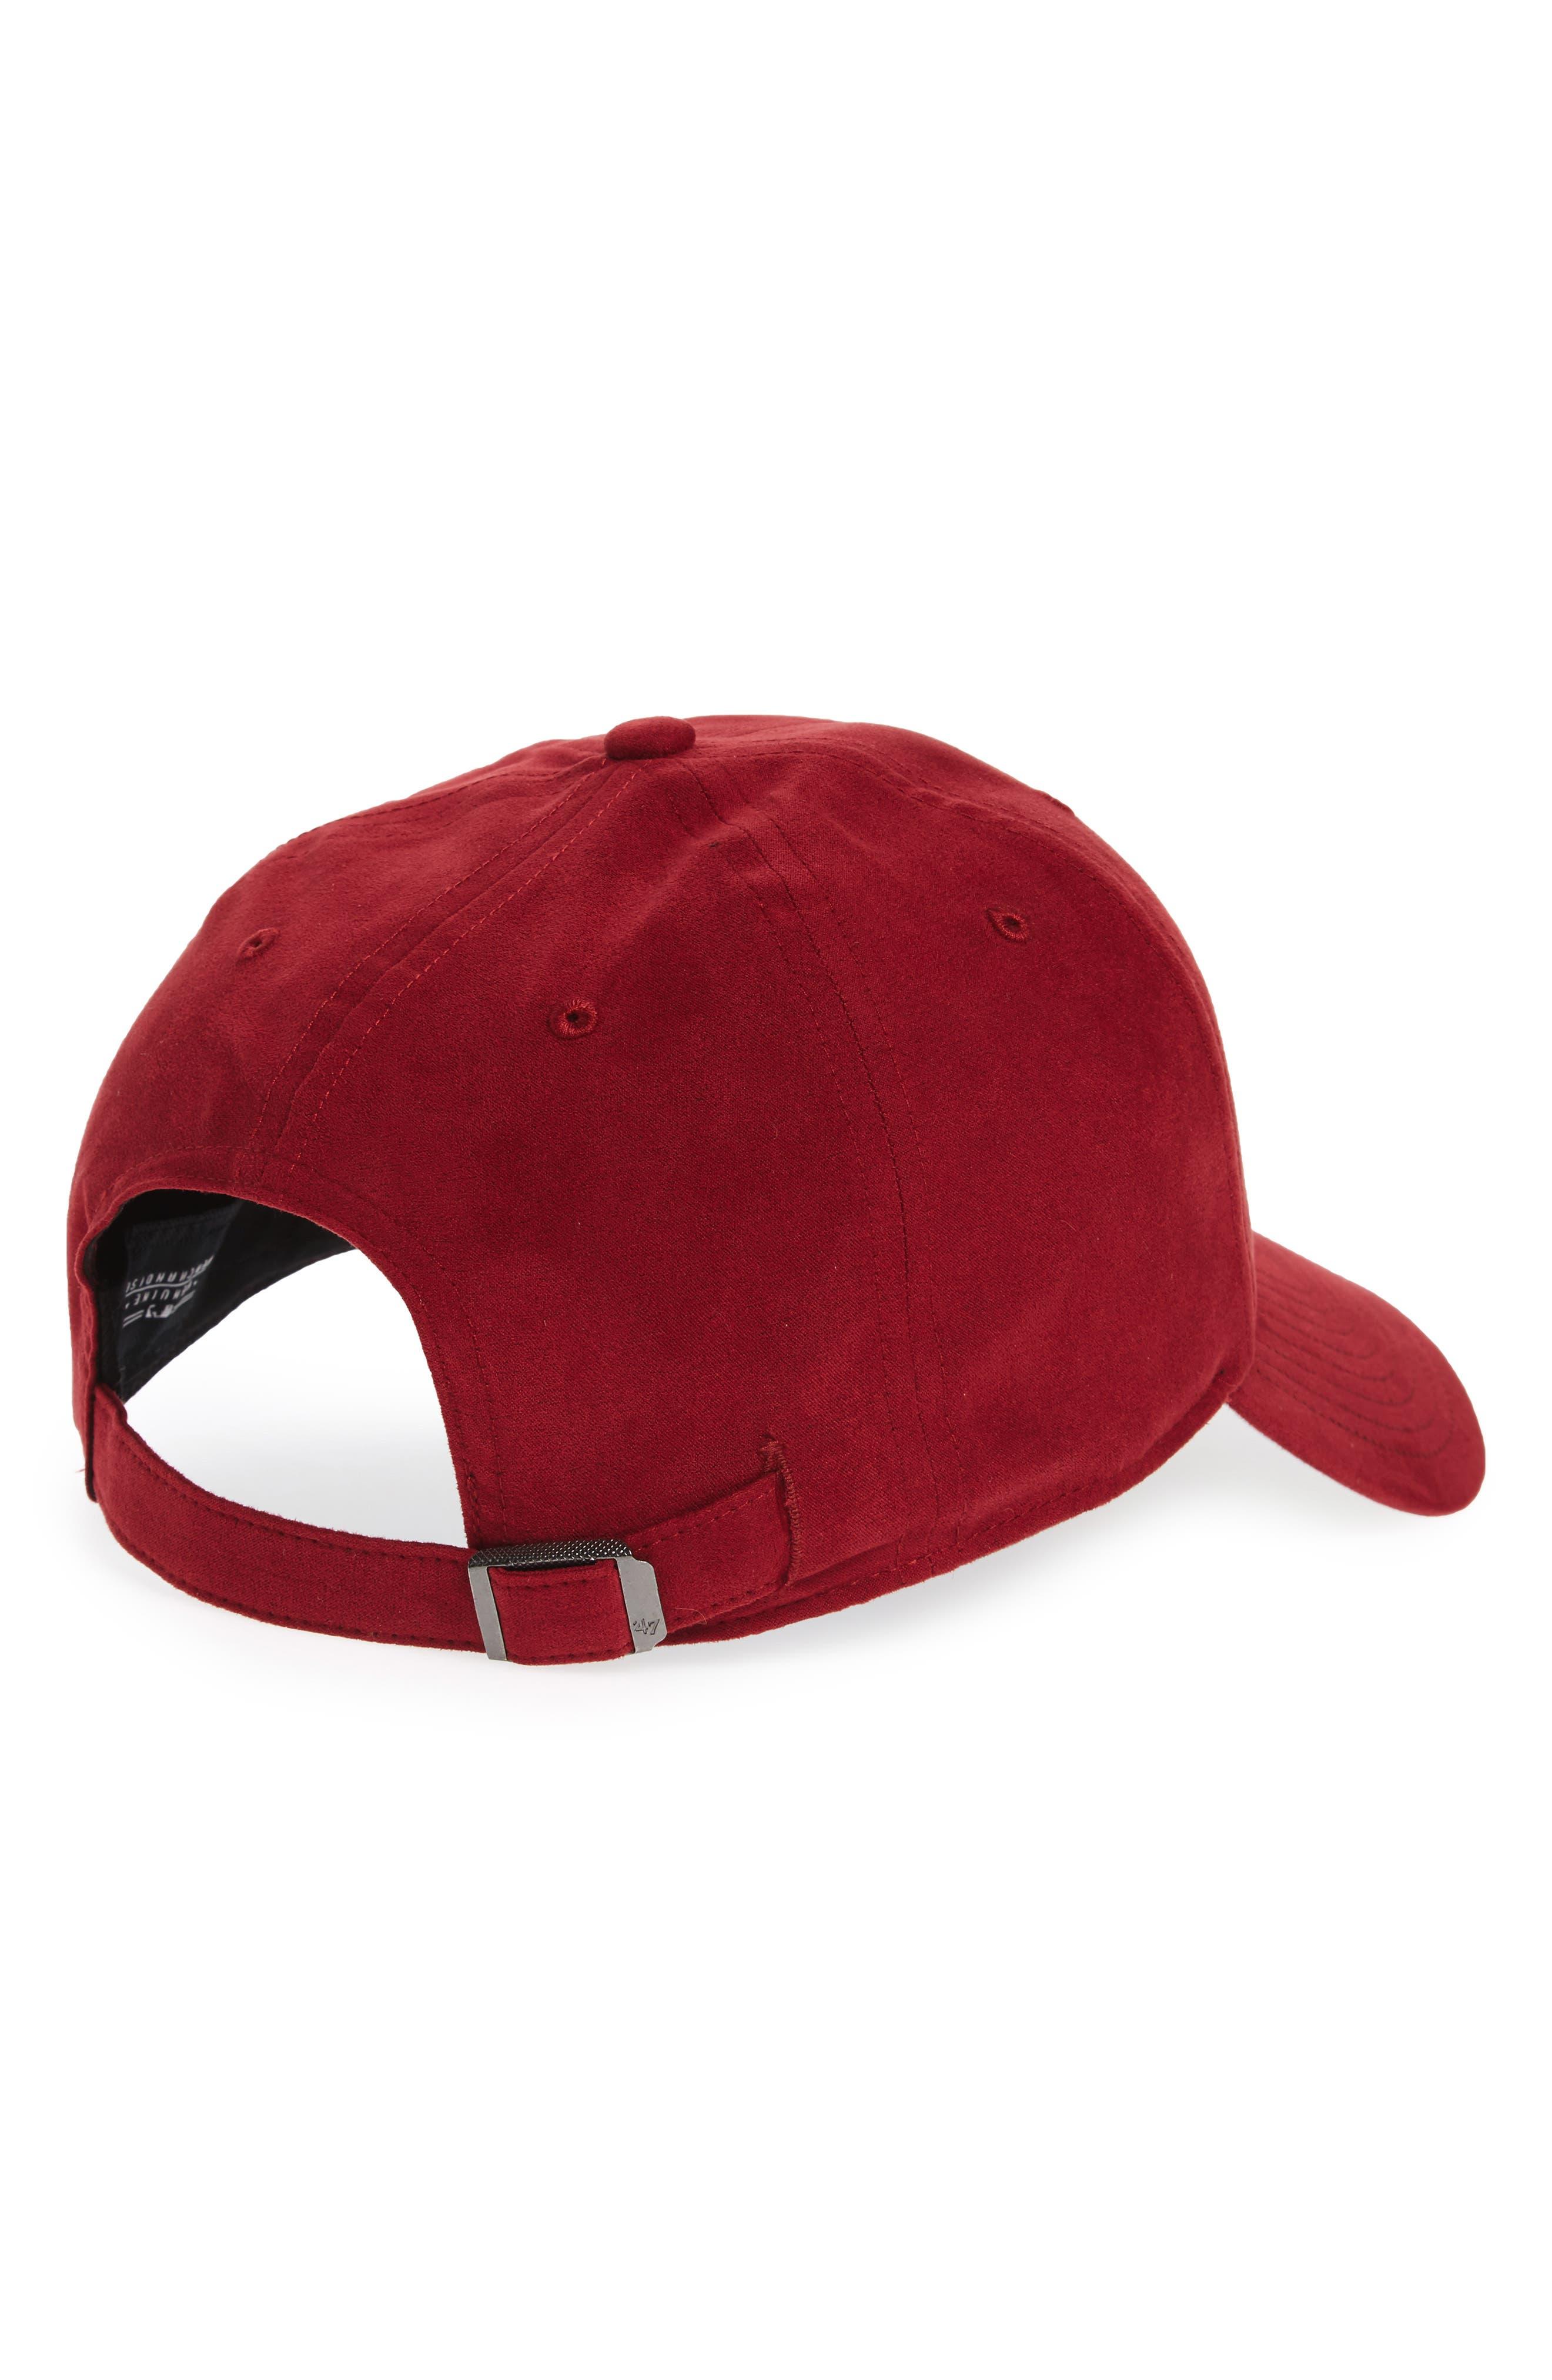 New York Yankees Baseball Cap,                             Alternate thumbnail 2, color,                             Maroon